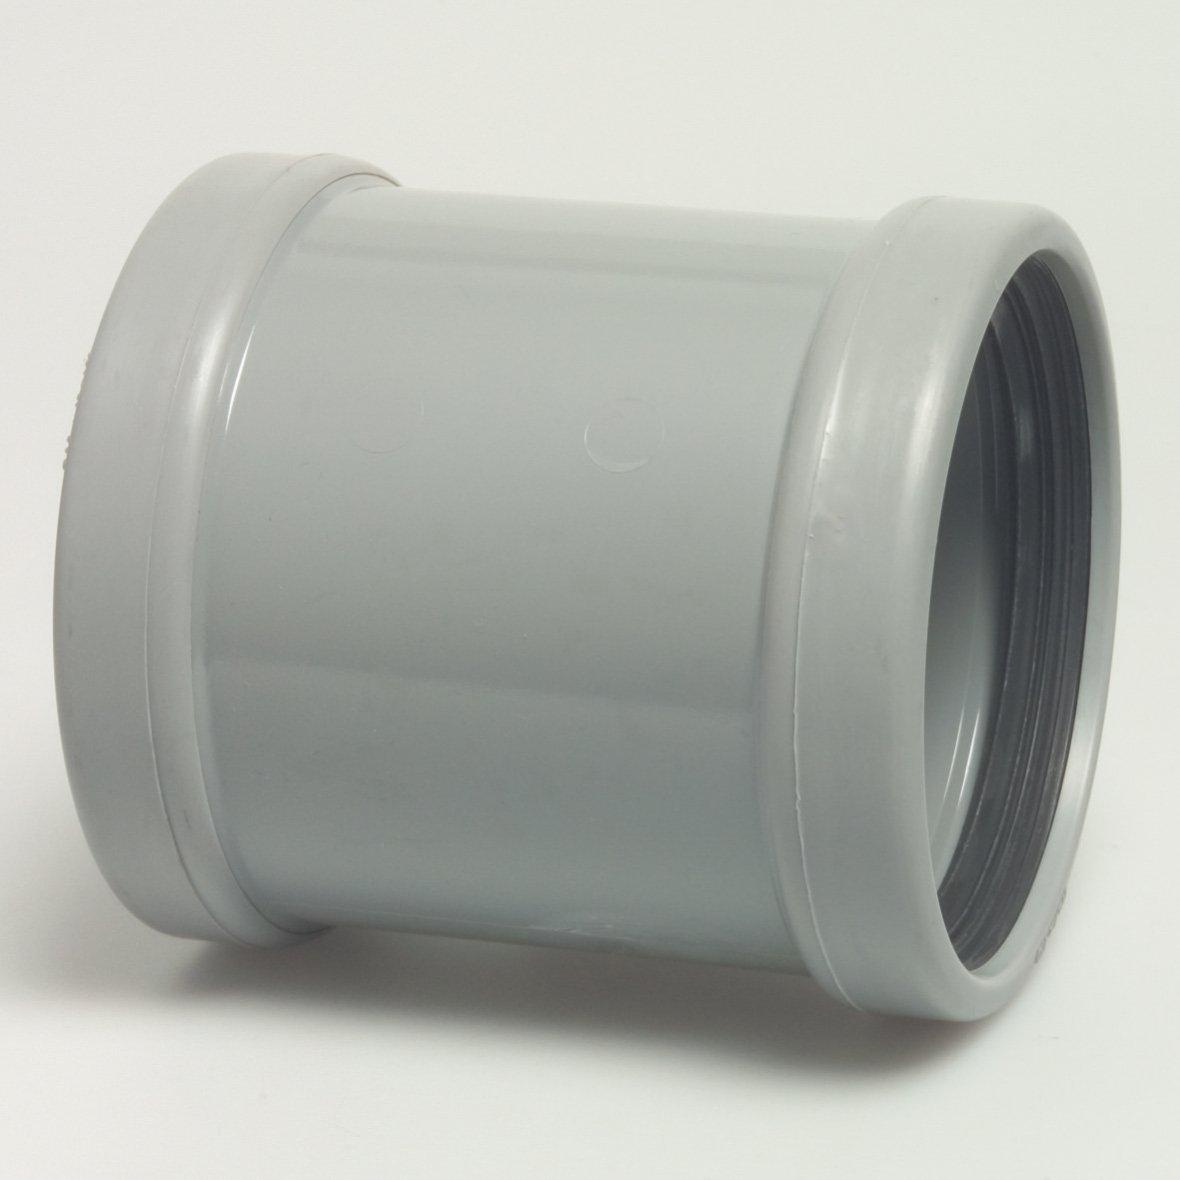 PVC push-on socket - ø 110 mm drain